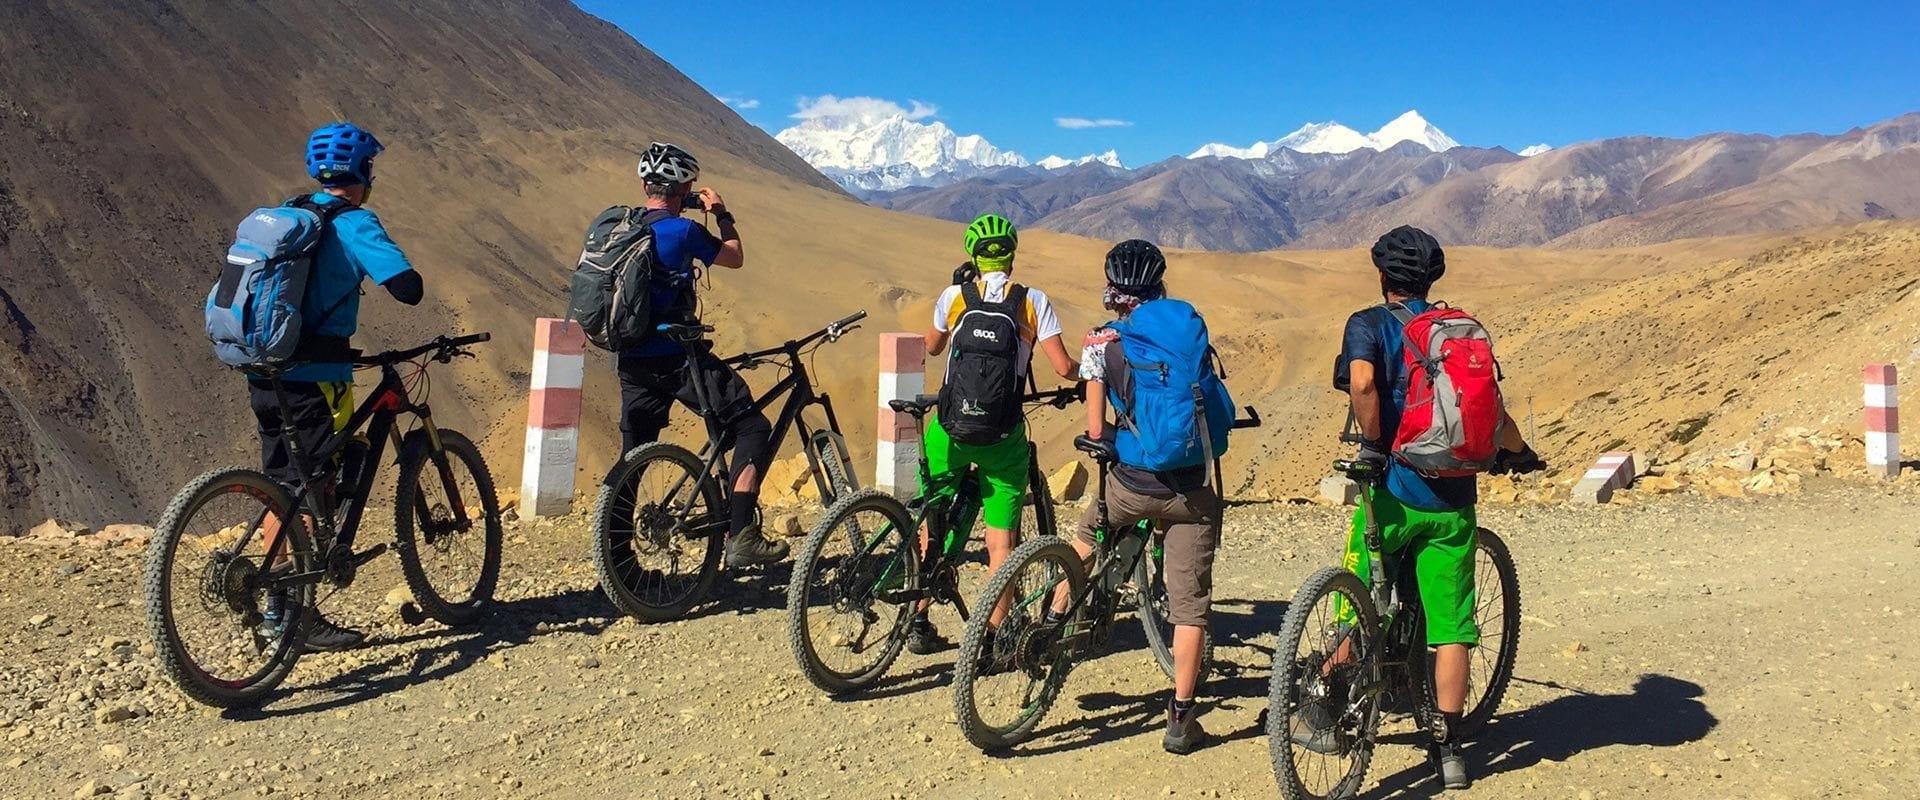 Bikereise zum Everest Basecamp in Tibet